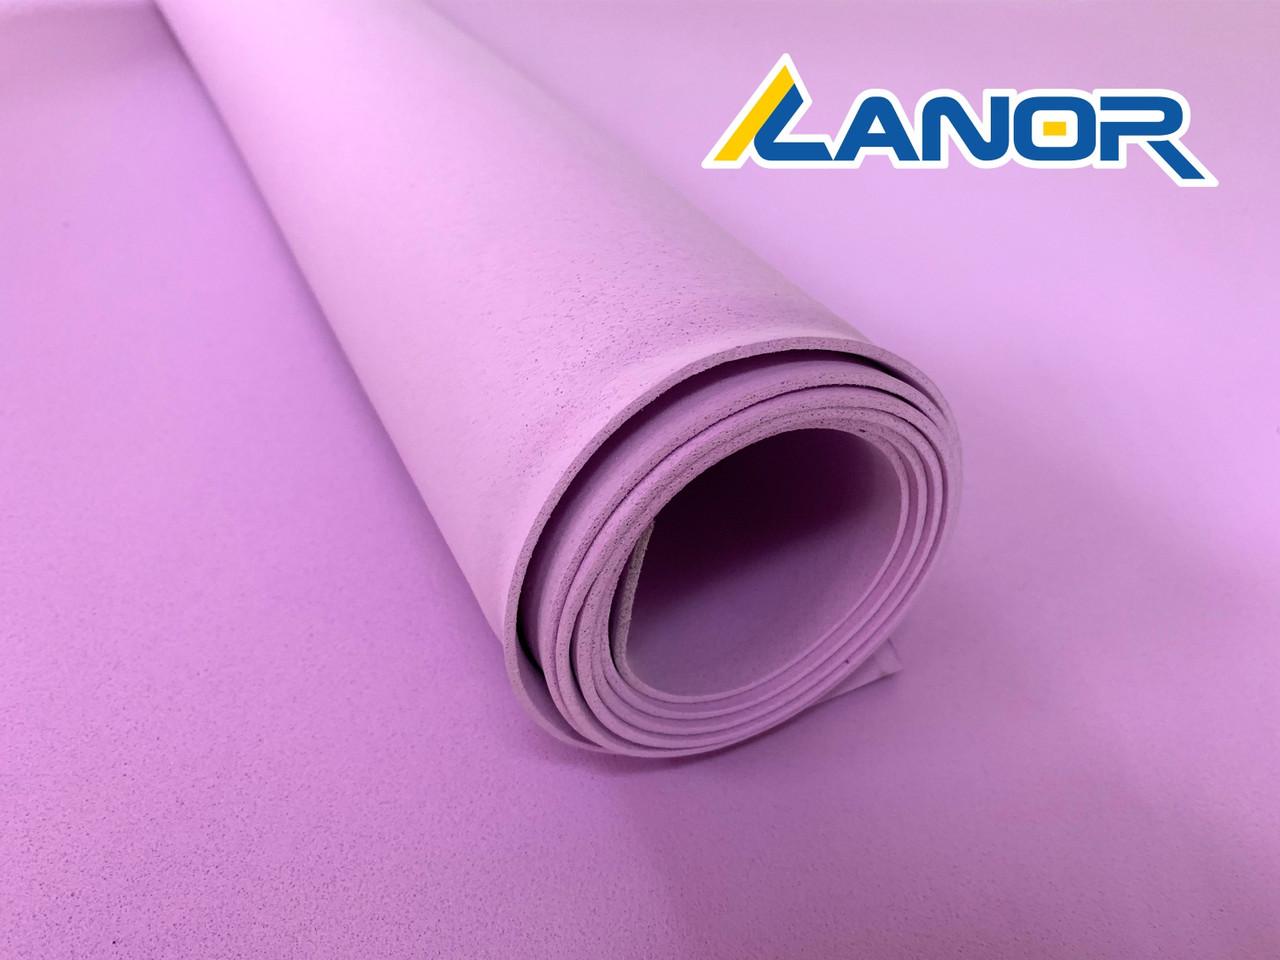 Lanor EVA 0075 лист 100*150см  (3мм) Розовый